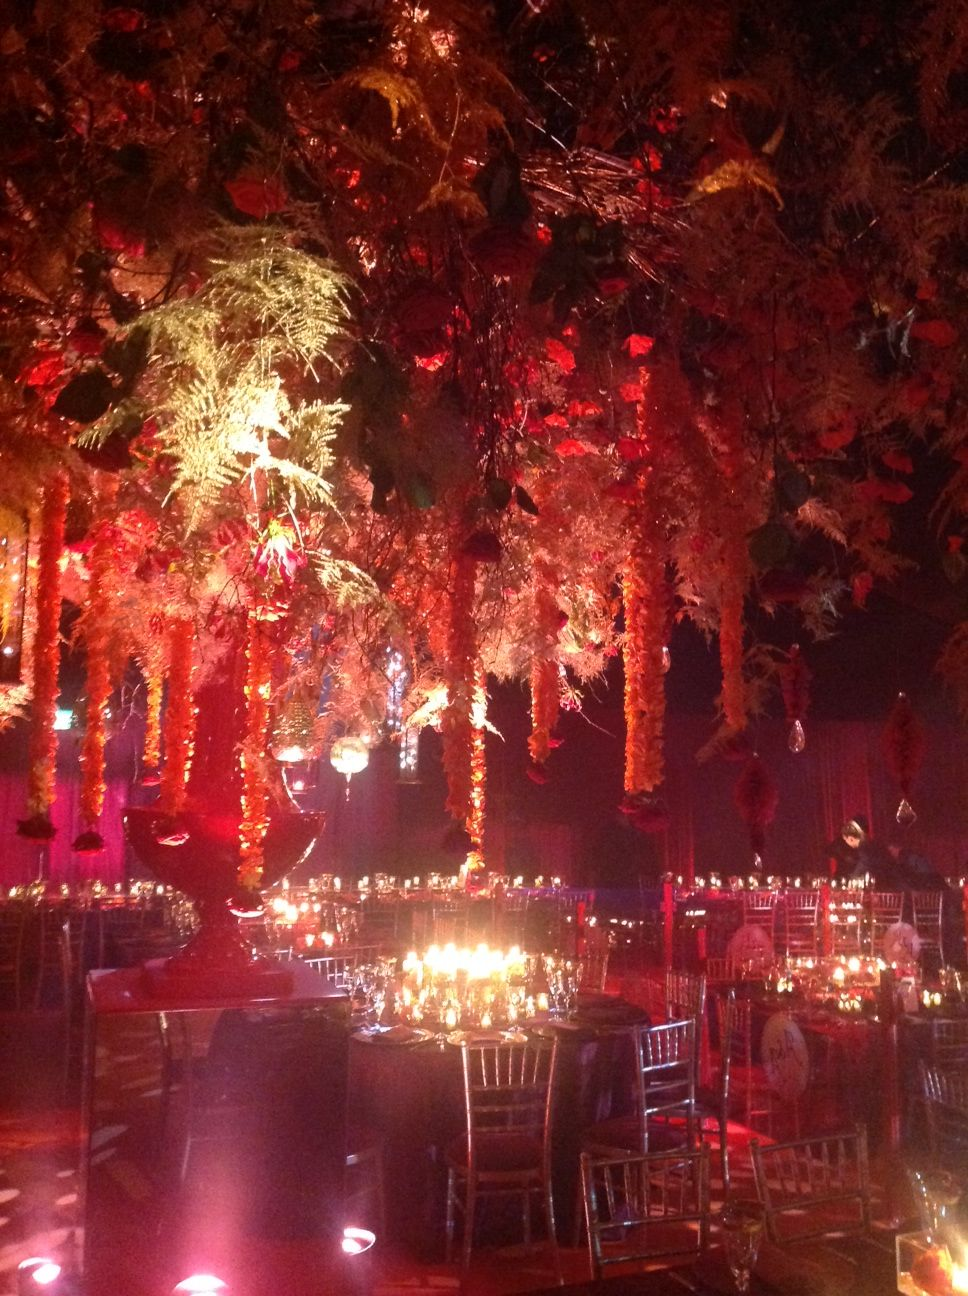 Beautiful wedding decor and room dressing by our floral partner beautiful wedding decor and room dressing by our floral partner springbank flowers springbankflowerswordpress mightylinksfo Choice Image